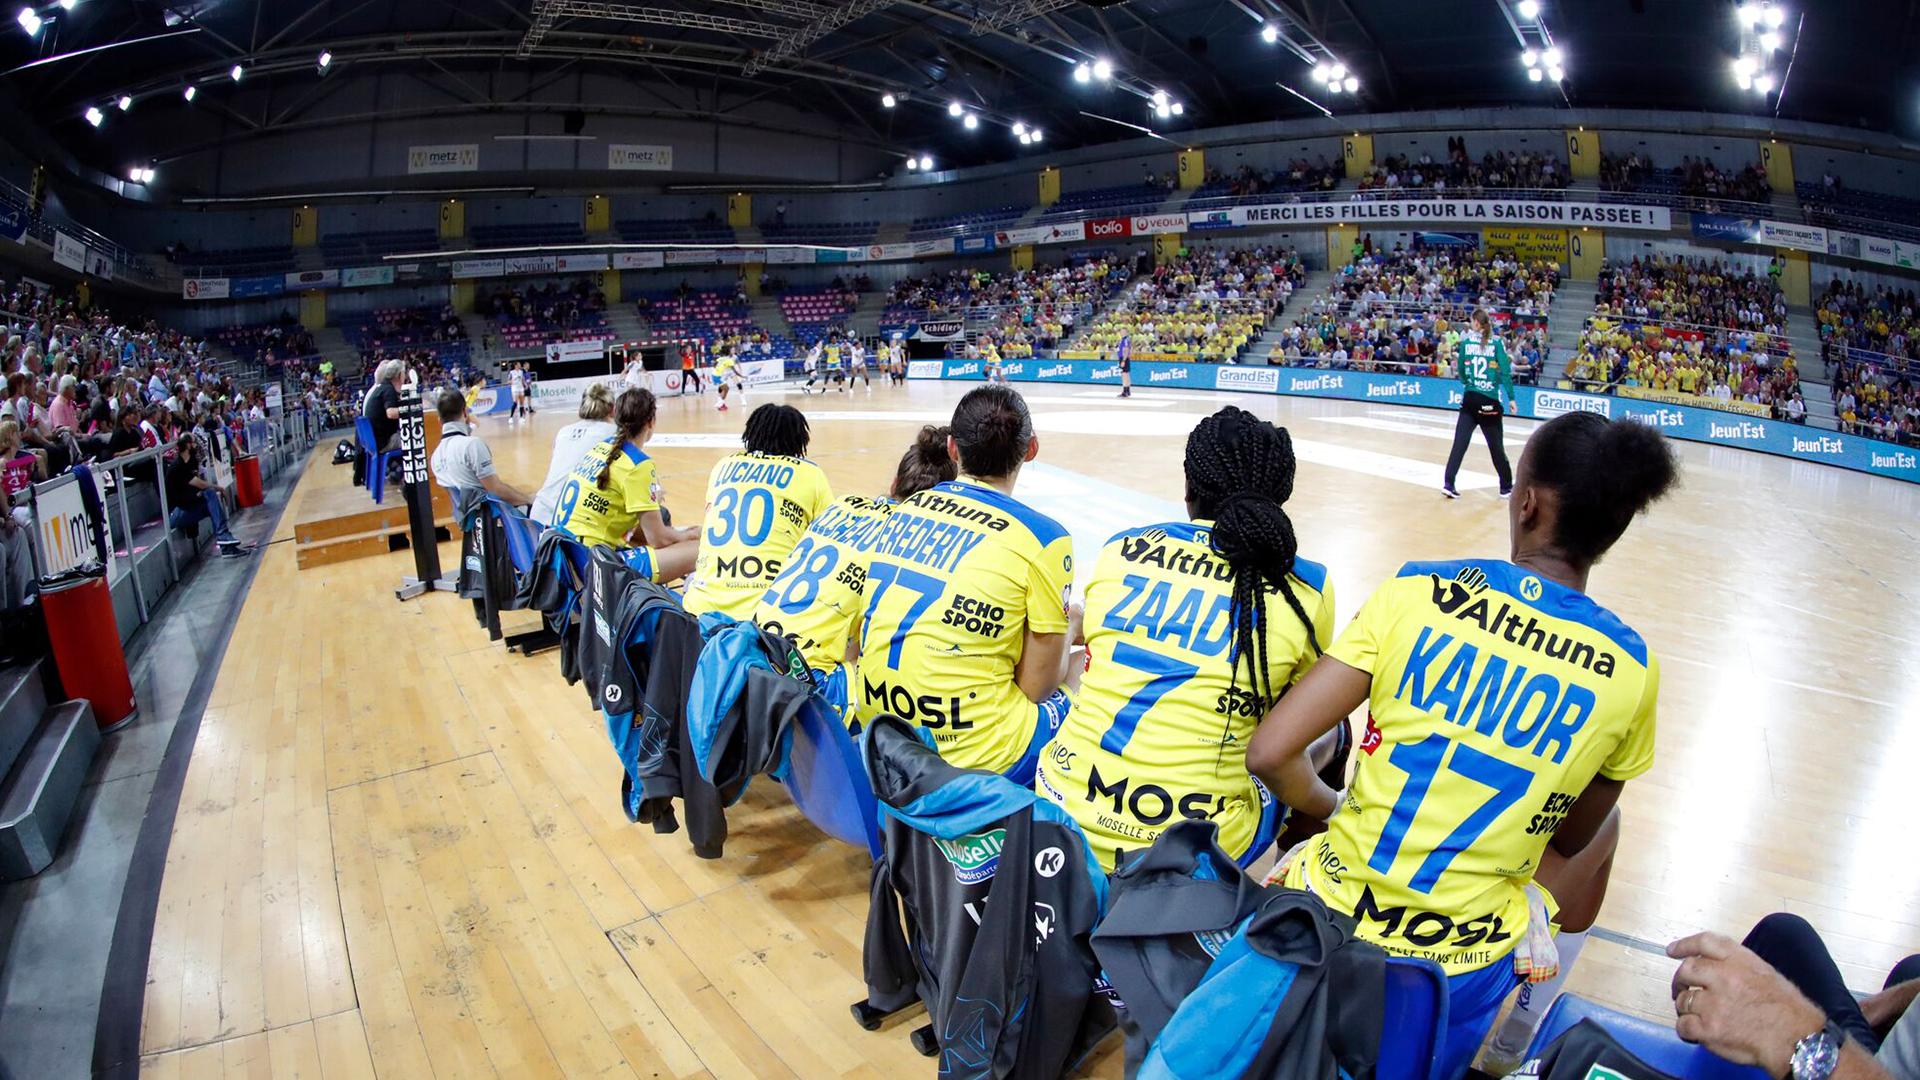 Banc messin Metz Handball Copyright : FFHandball S.Pillaud